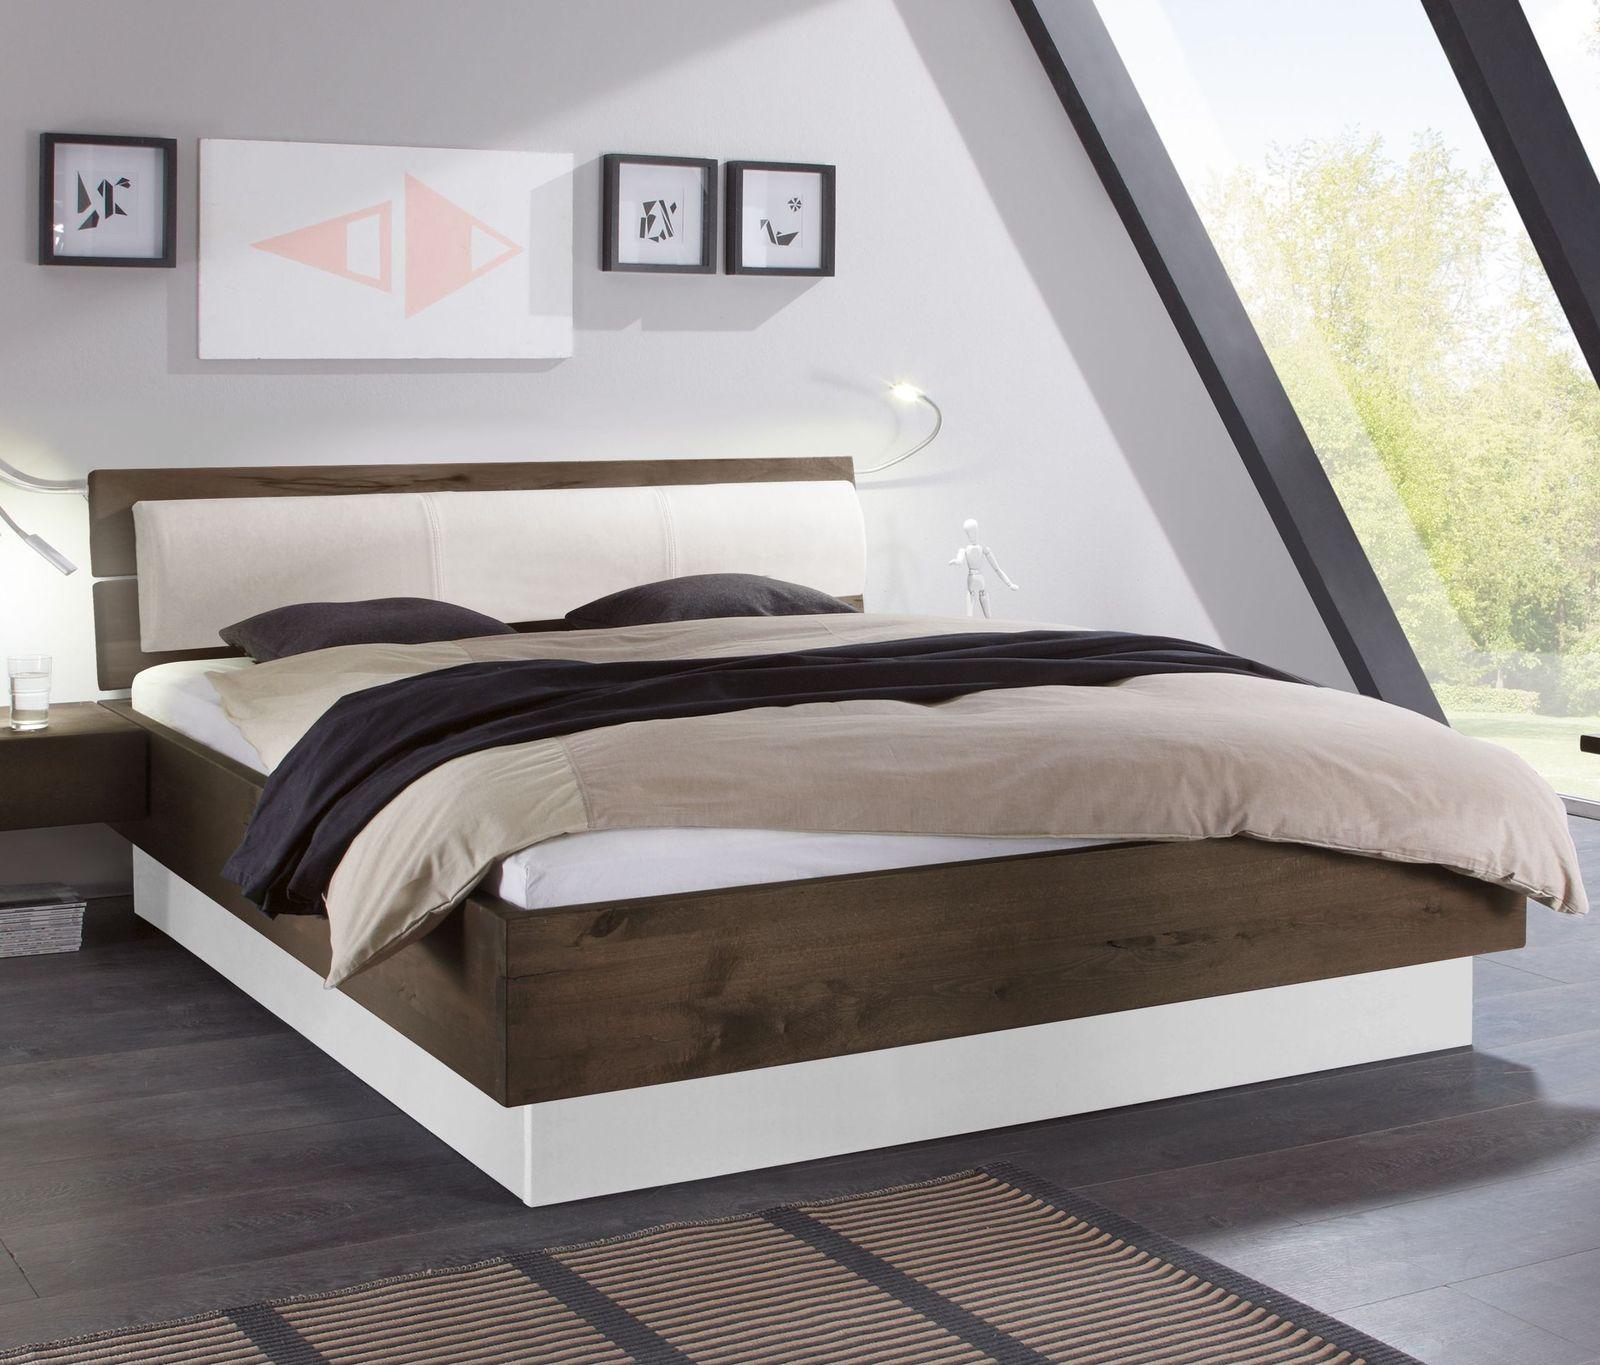 ungew hnlich sockel bettrahmen ideen bilderrahmen ideen. Black Bedroom Furniture Sets. Home Design Ideas